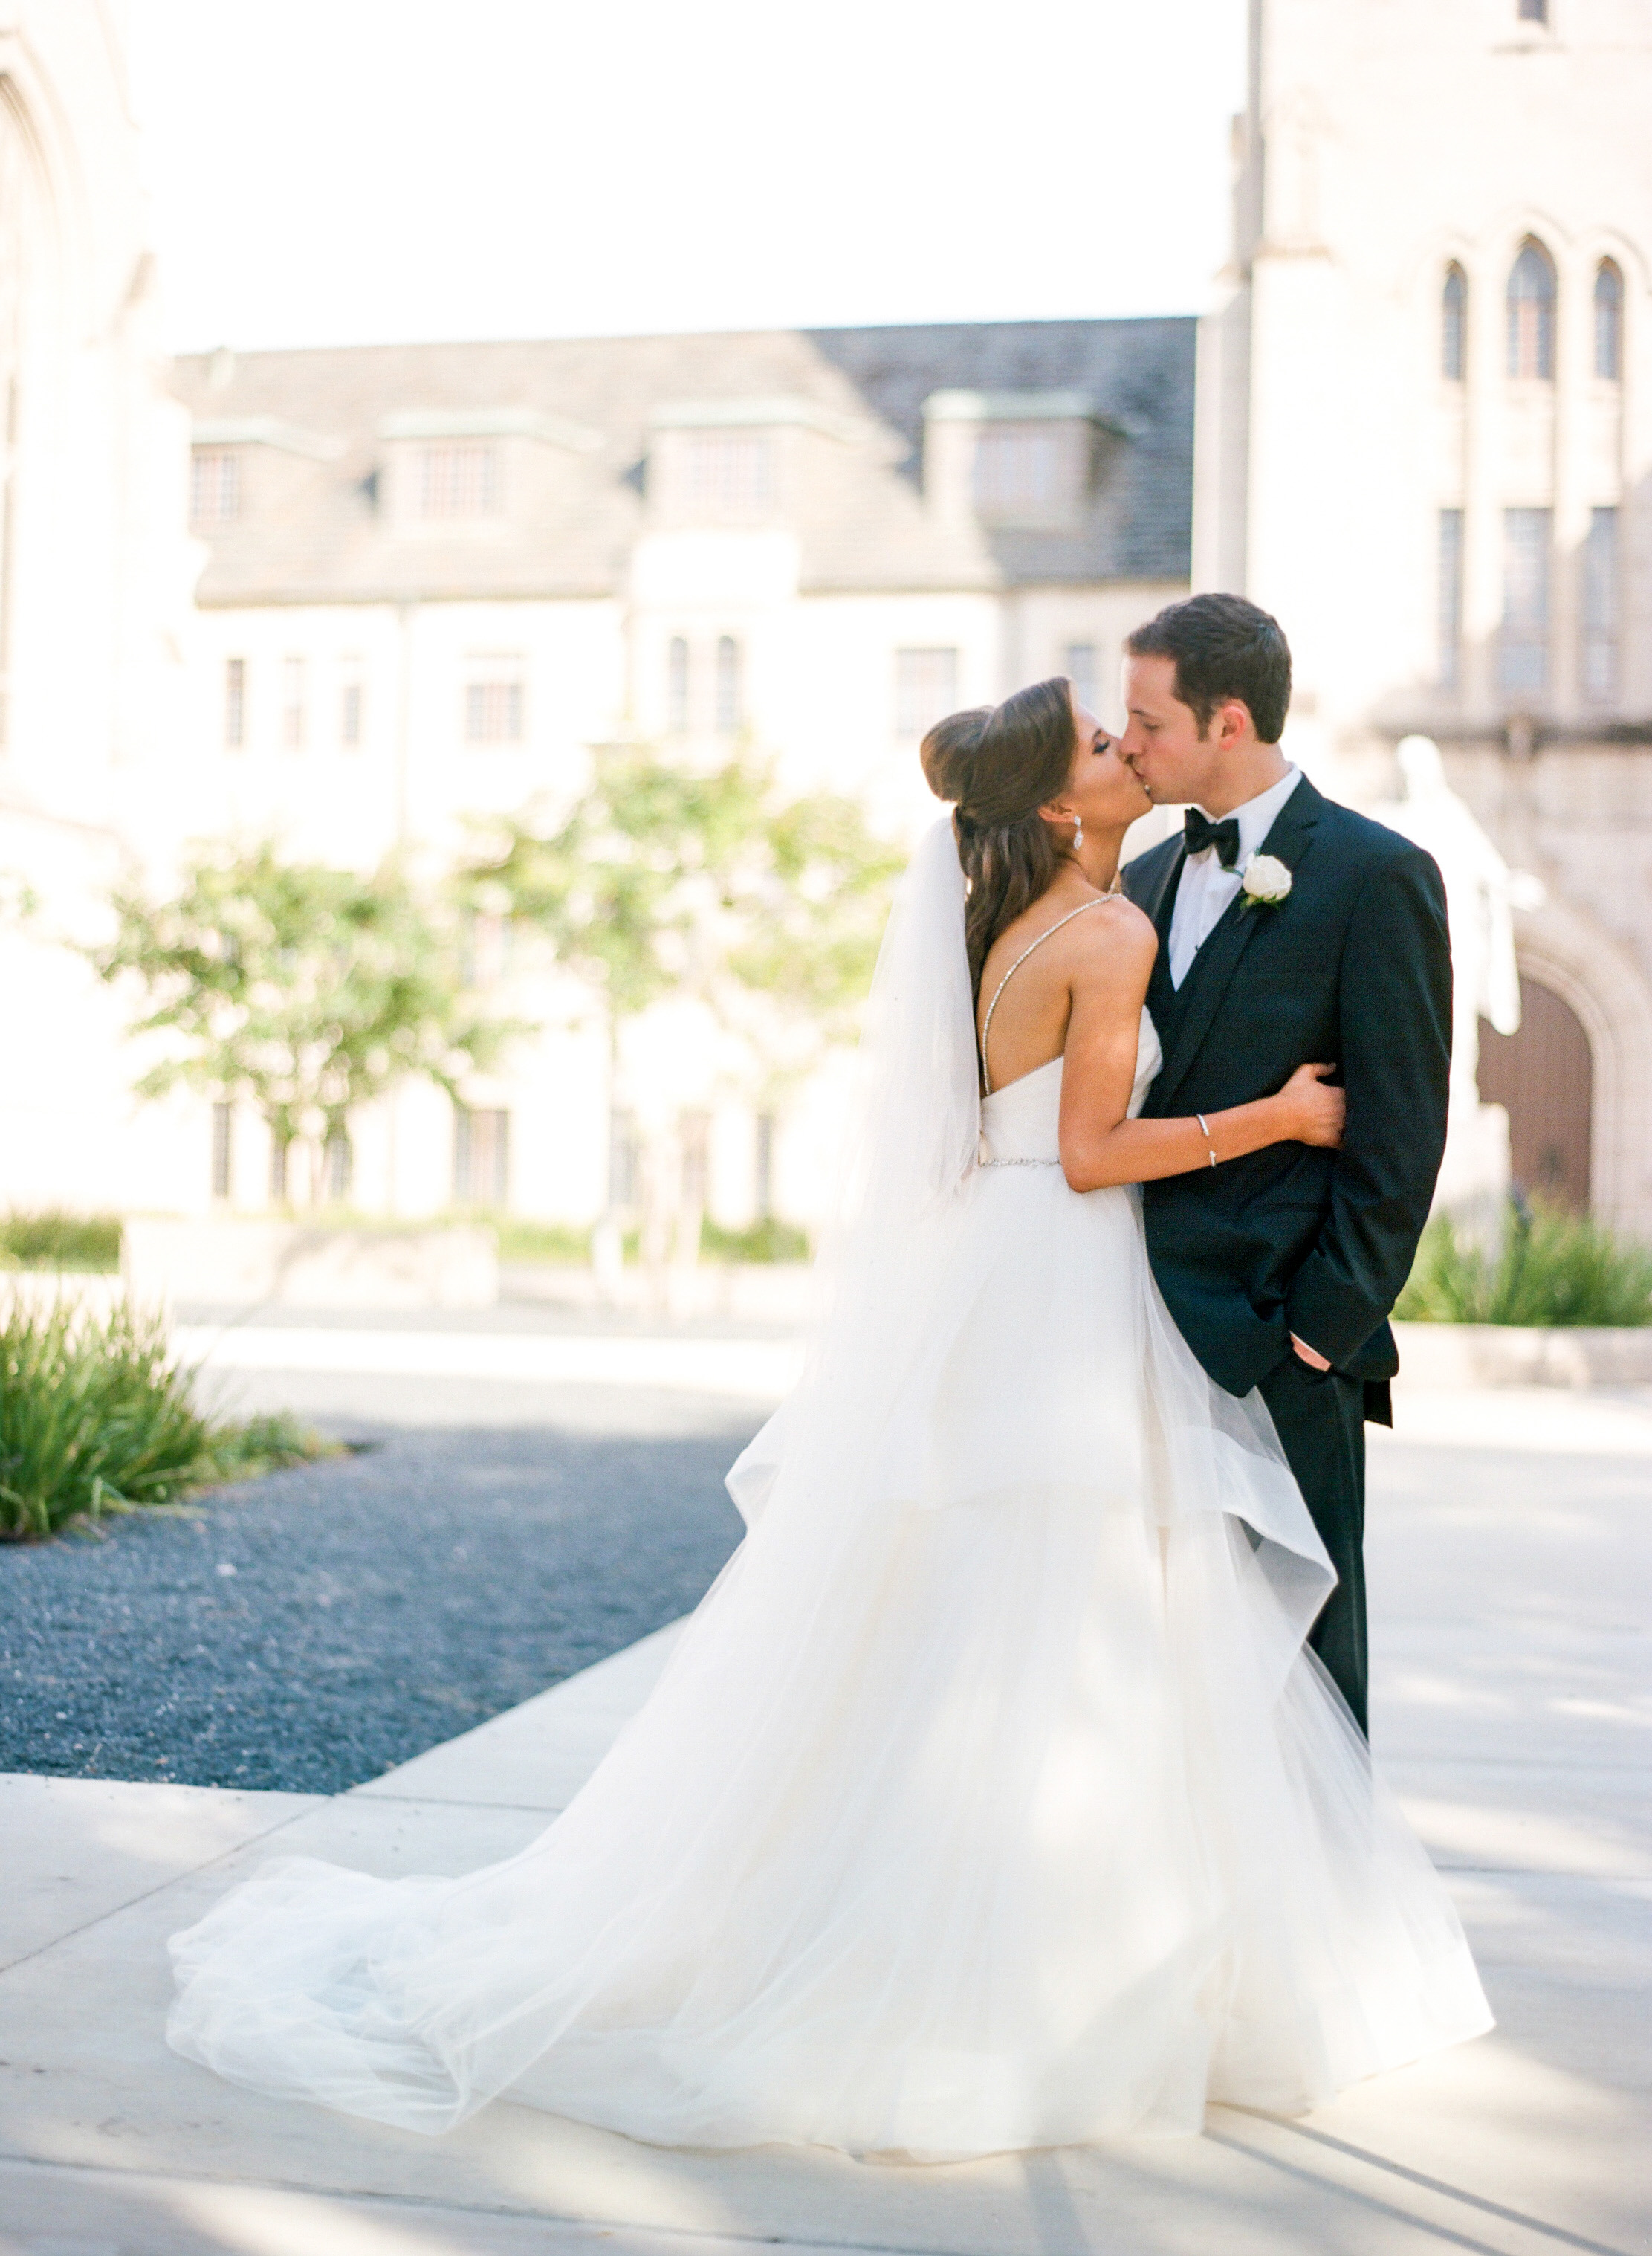 Dana-Fernandez-Photography-Weddings-in-Houston-Magazine-feature-Houston-wedding-photographer-film-1.jpg